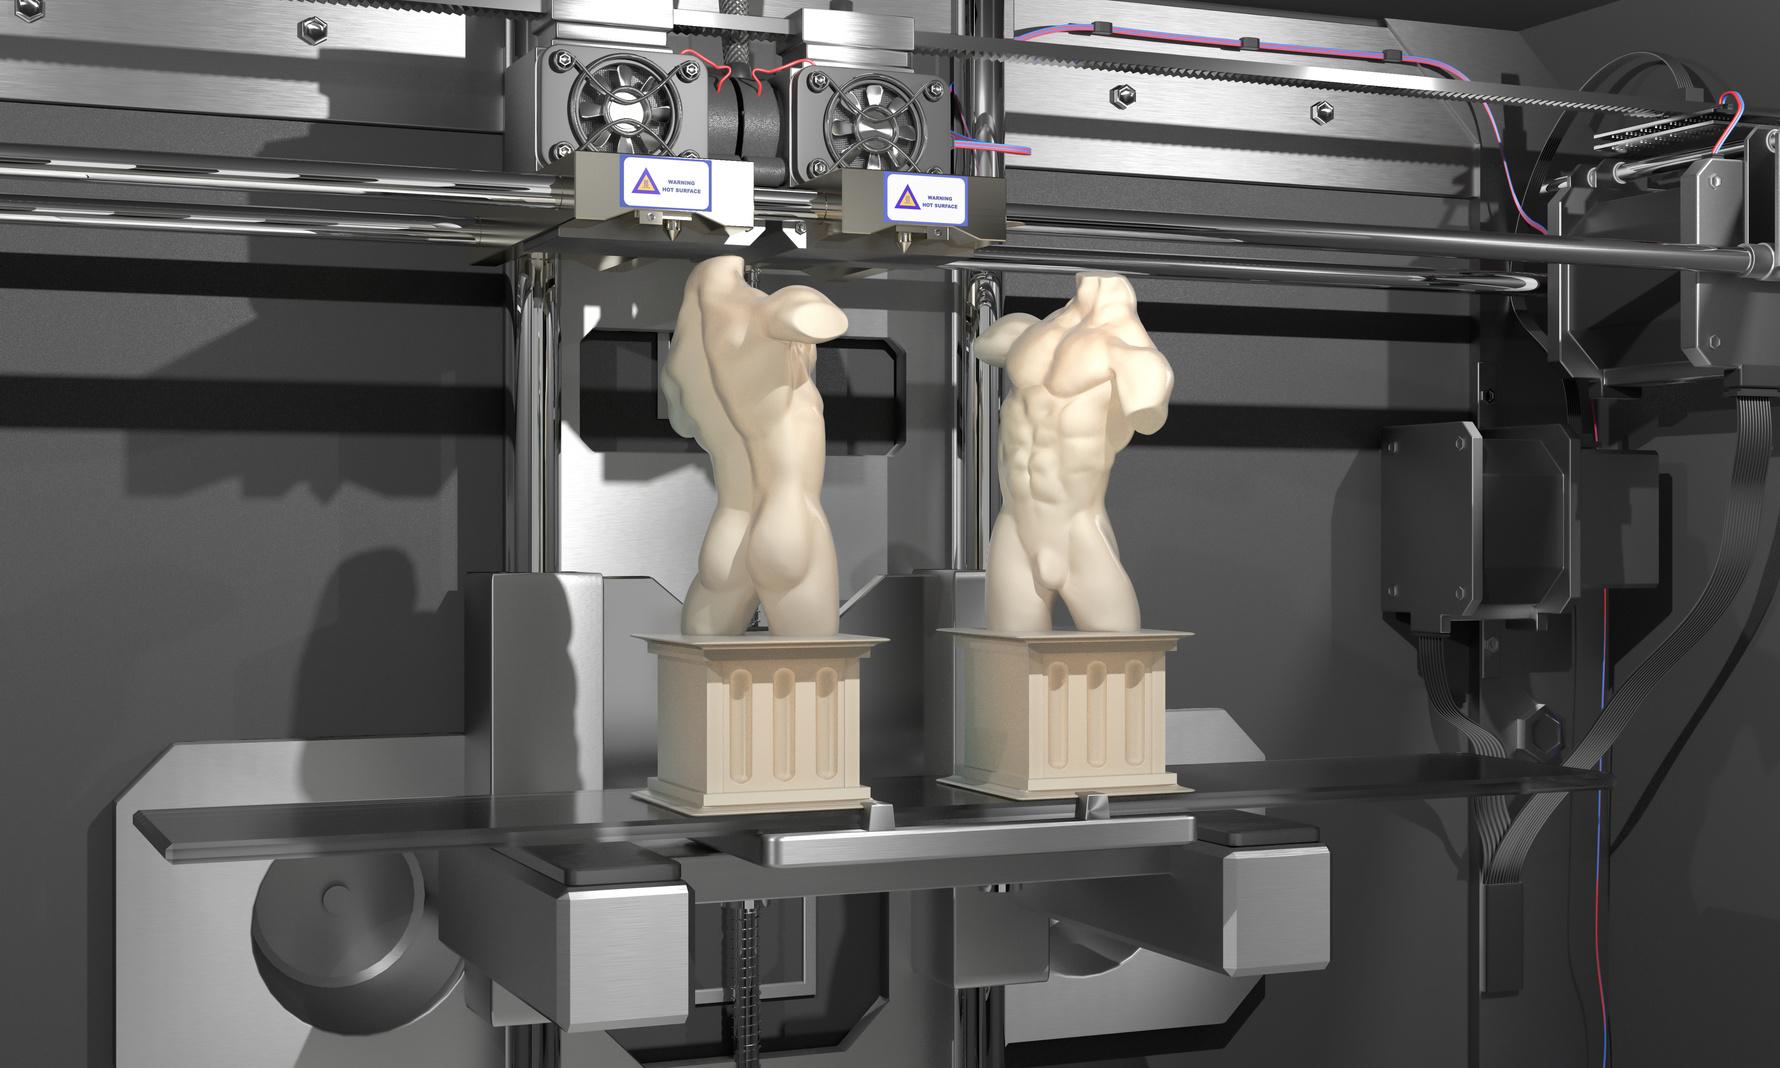 Objets imprimante 3D